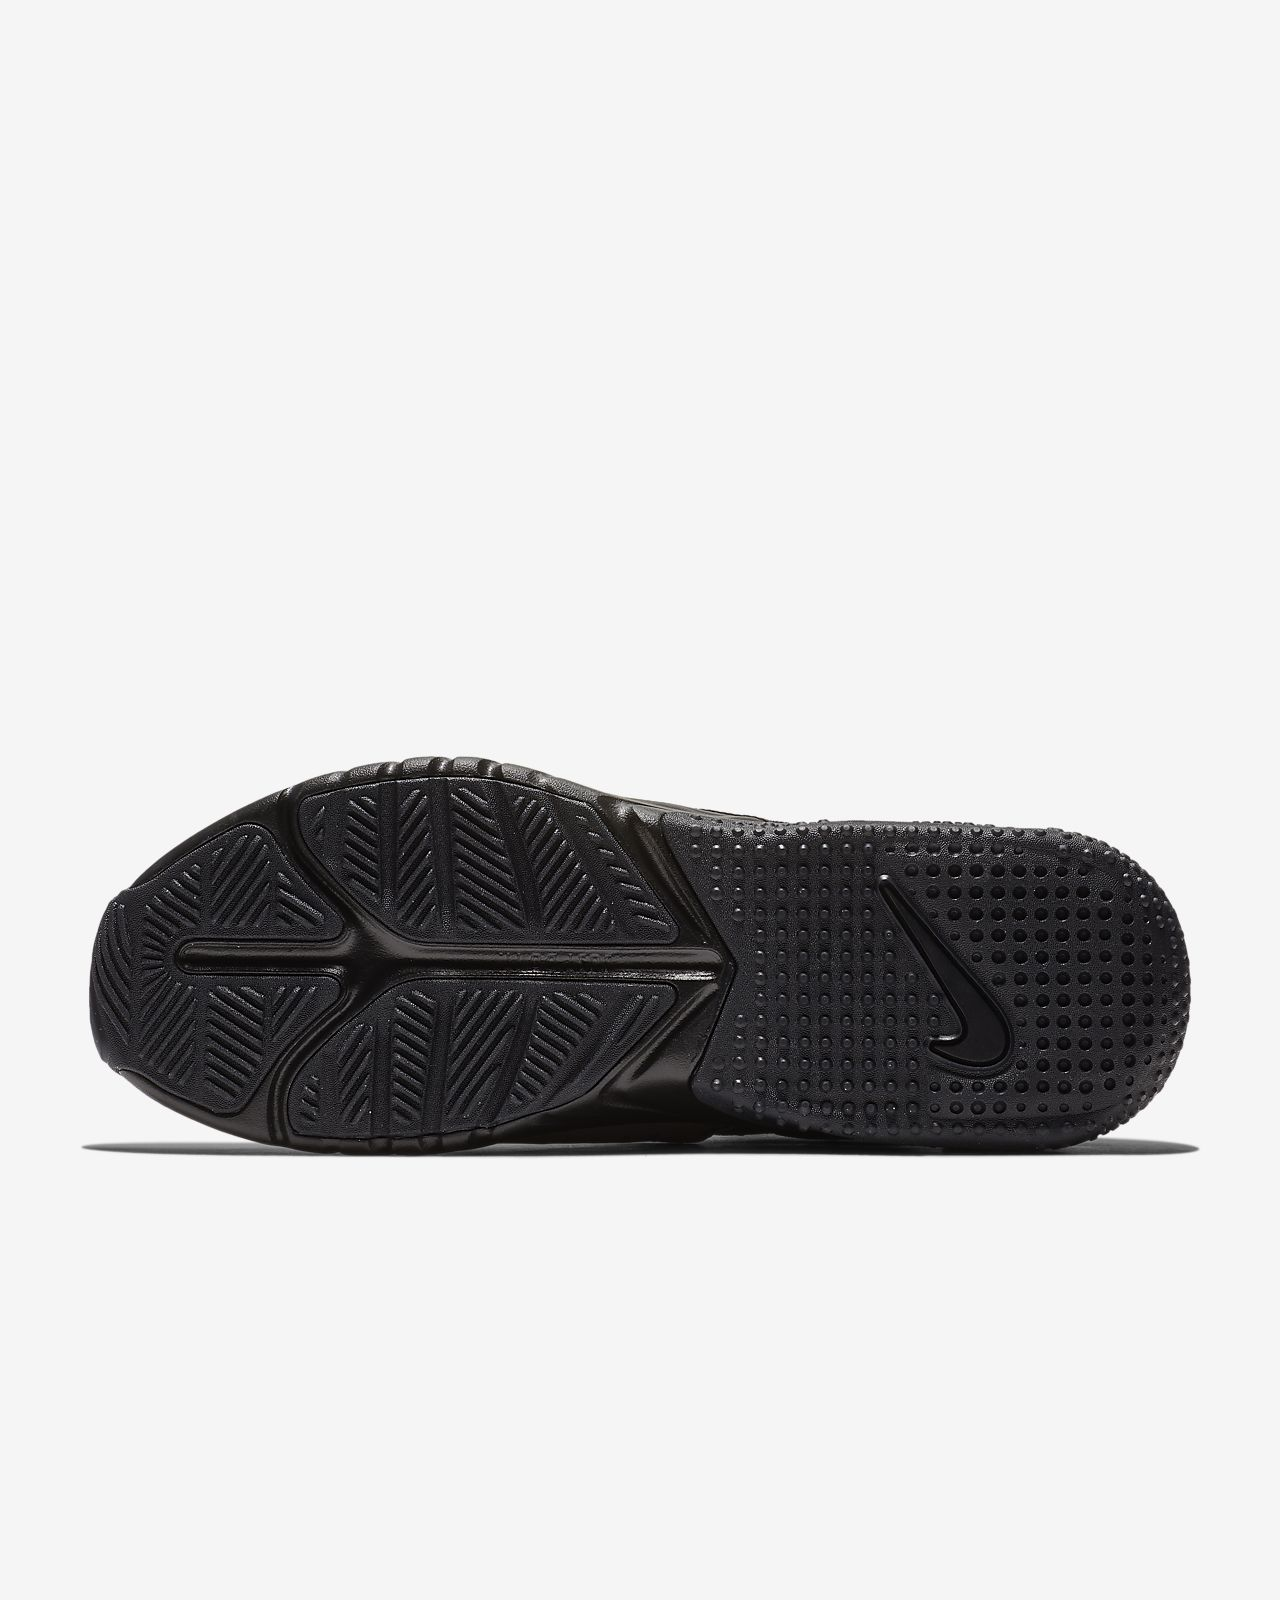 ea67948ee52a Nike Air Max Trainer 1 AMP Men s Training Shoe. Nike.com